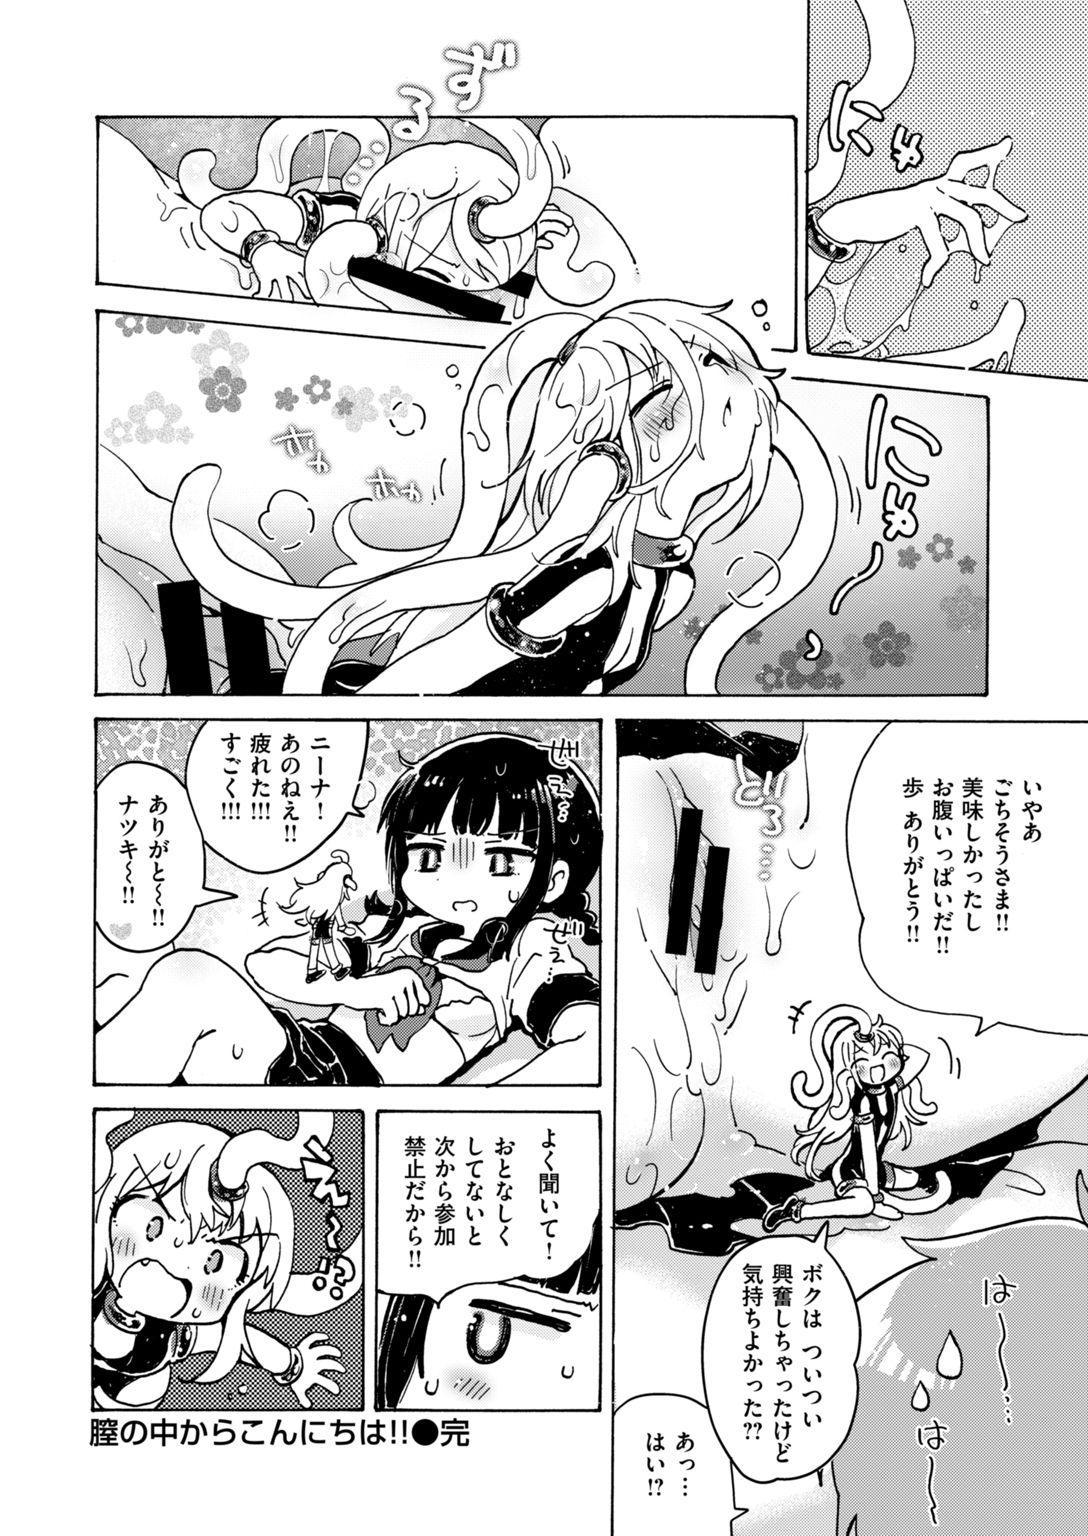 COMIC HAPPINING Vol. 2 34